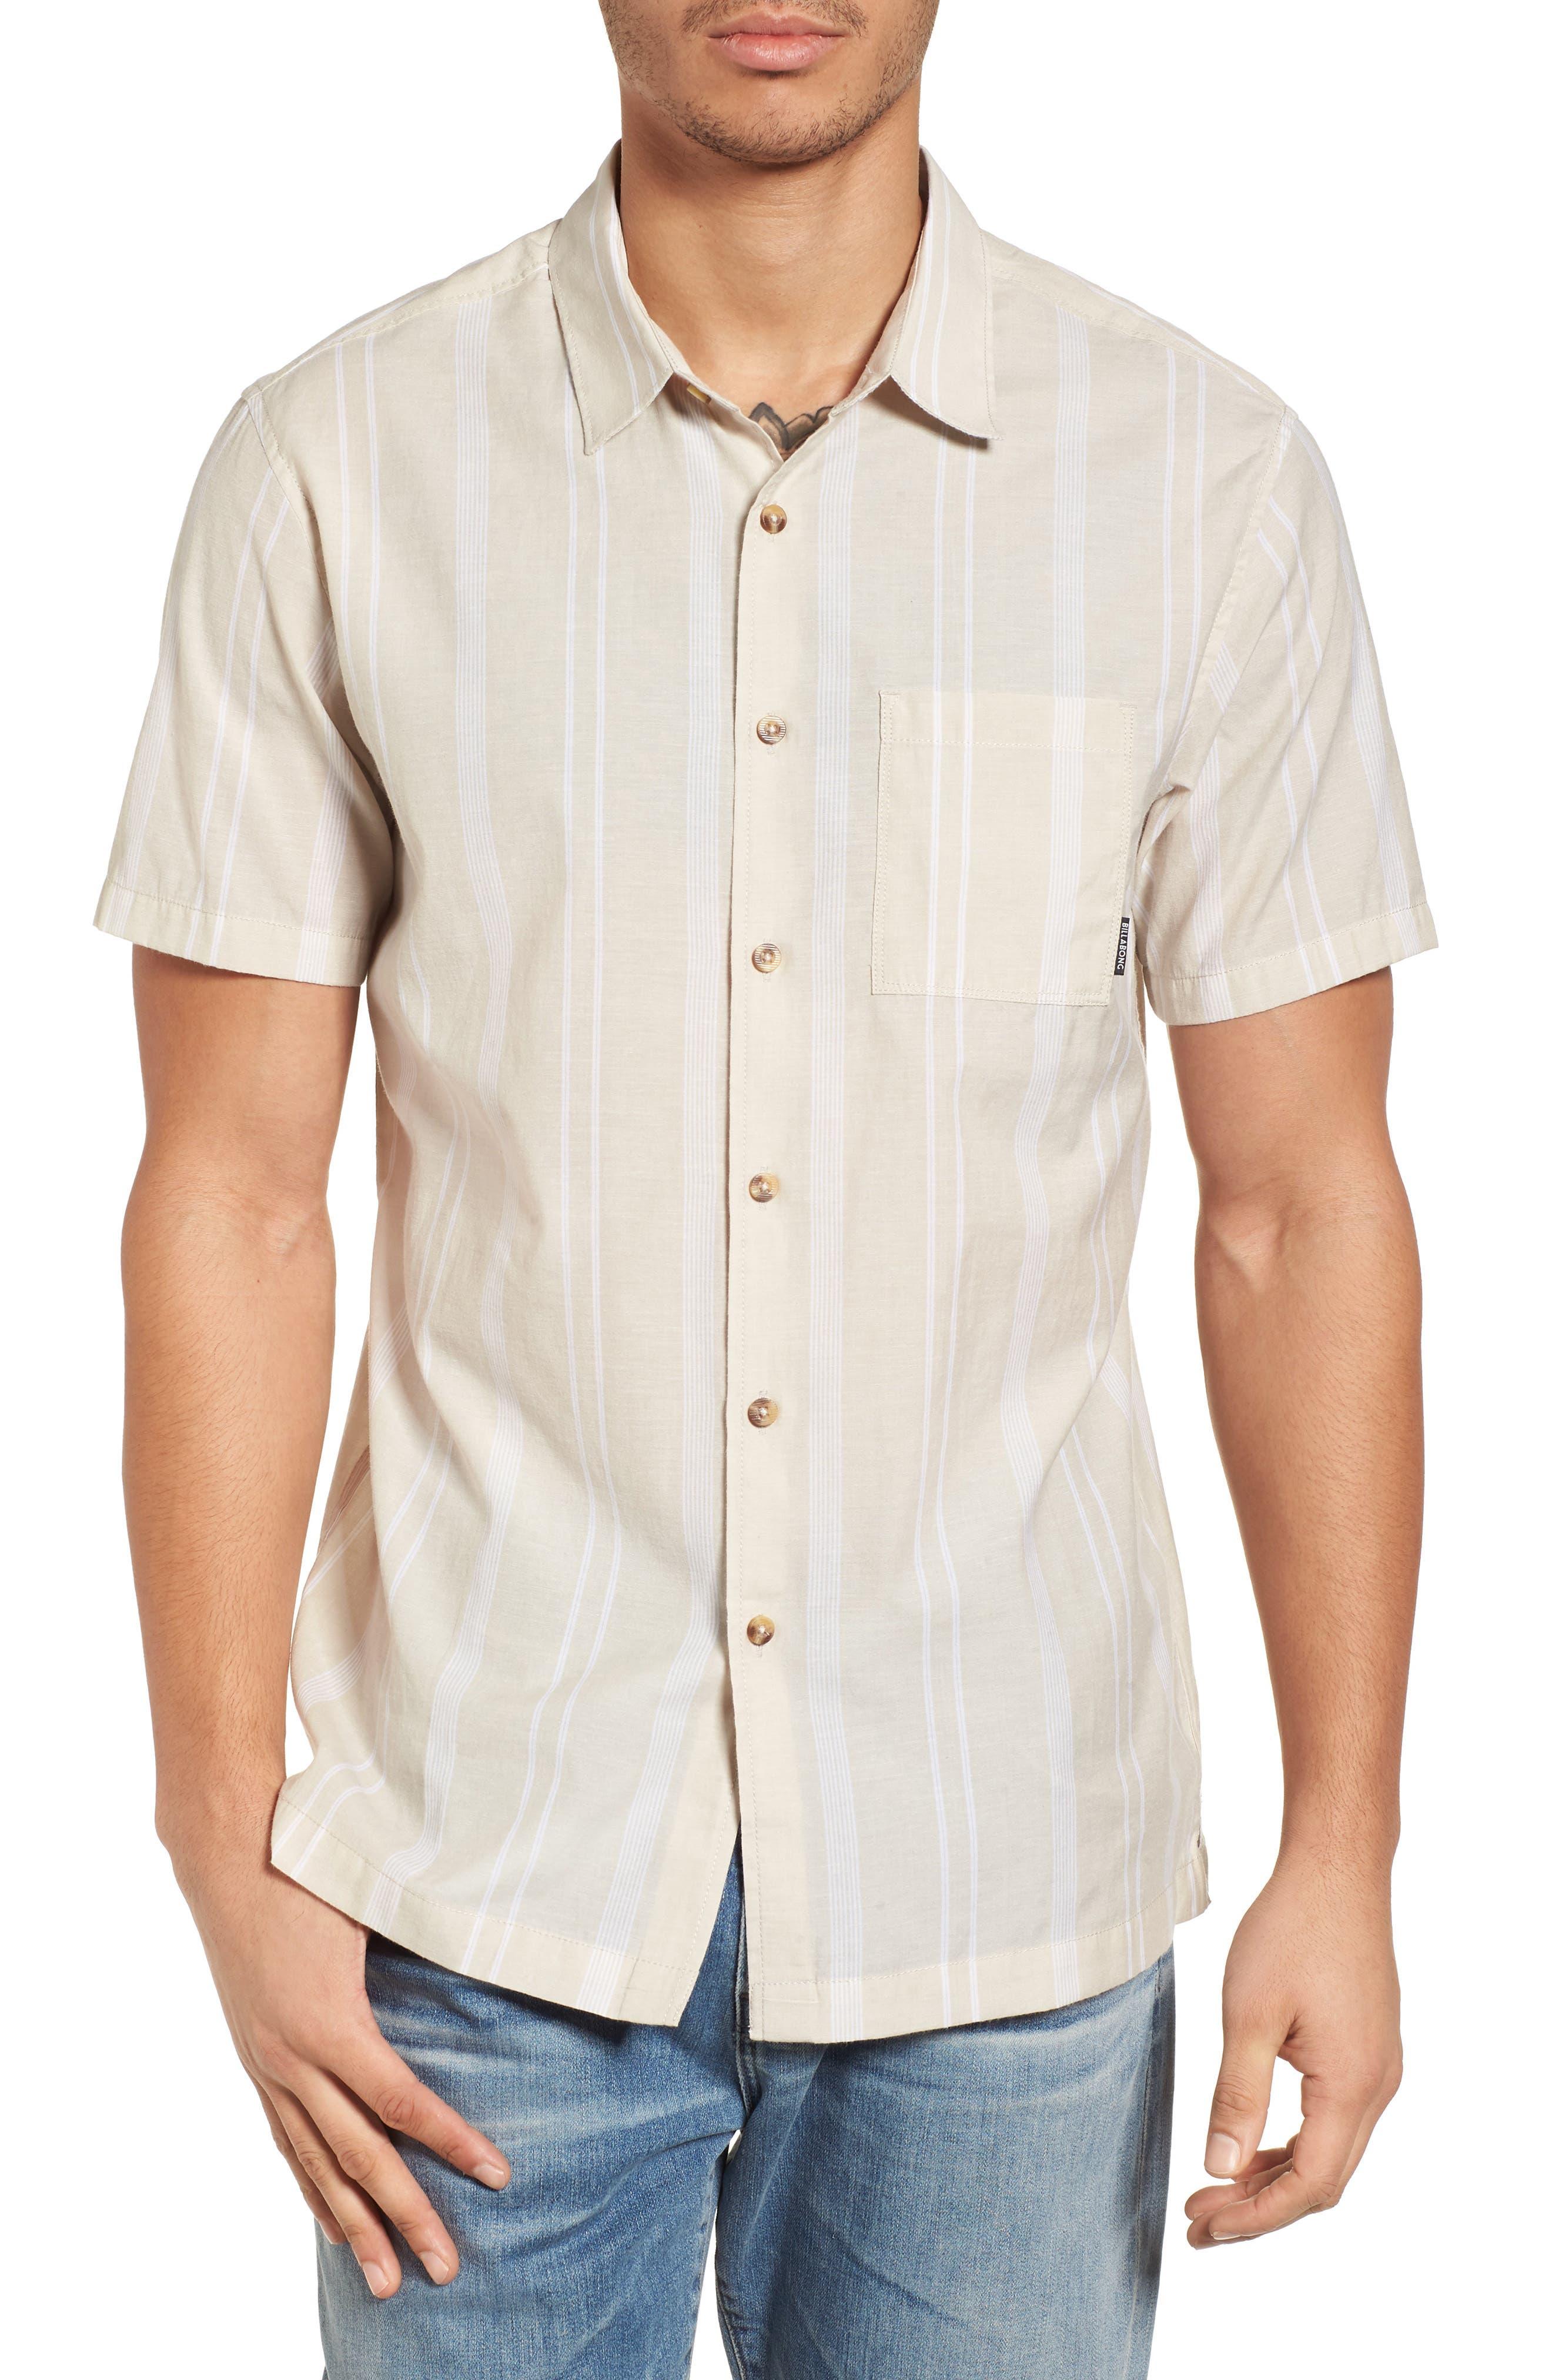 Main Image - Billabong Donny Short Sleeve Shirt